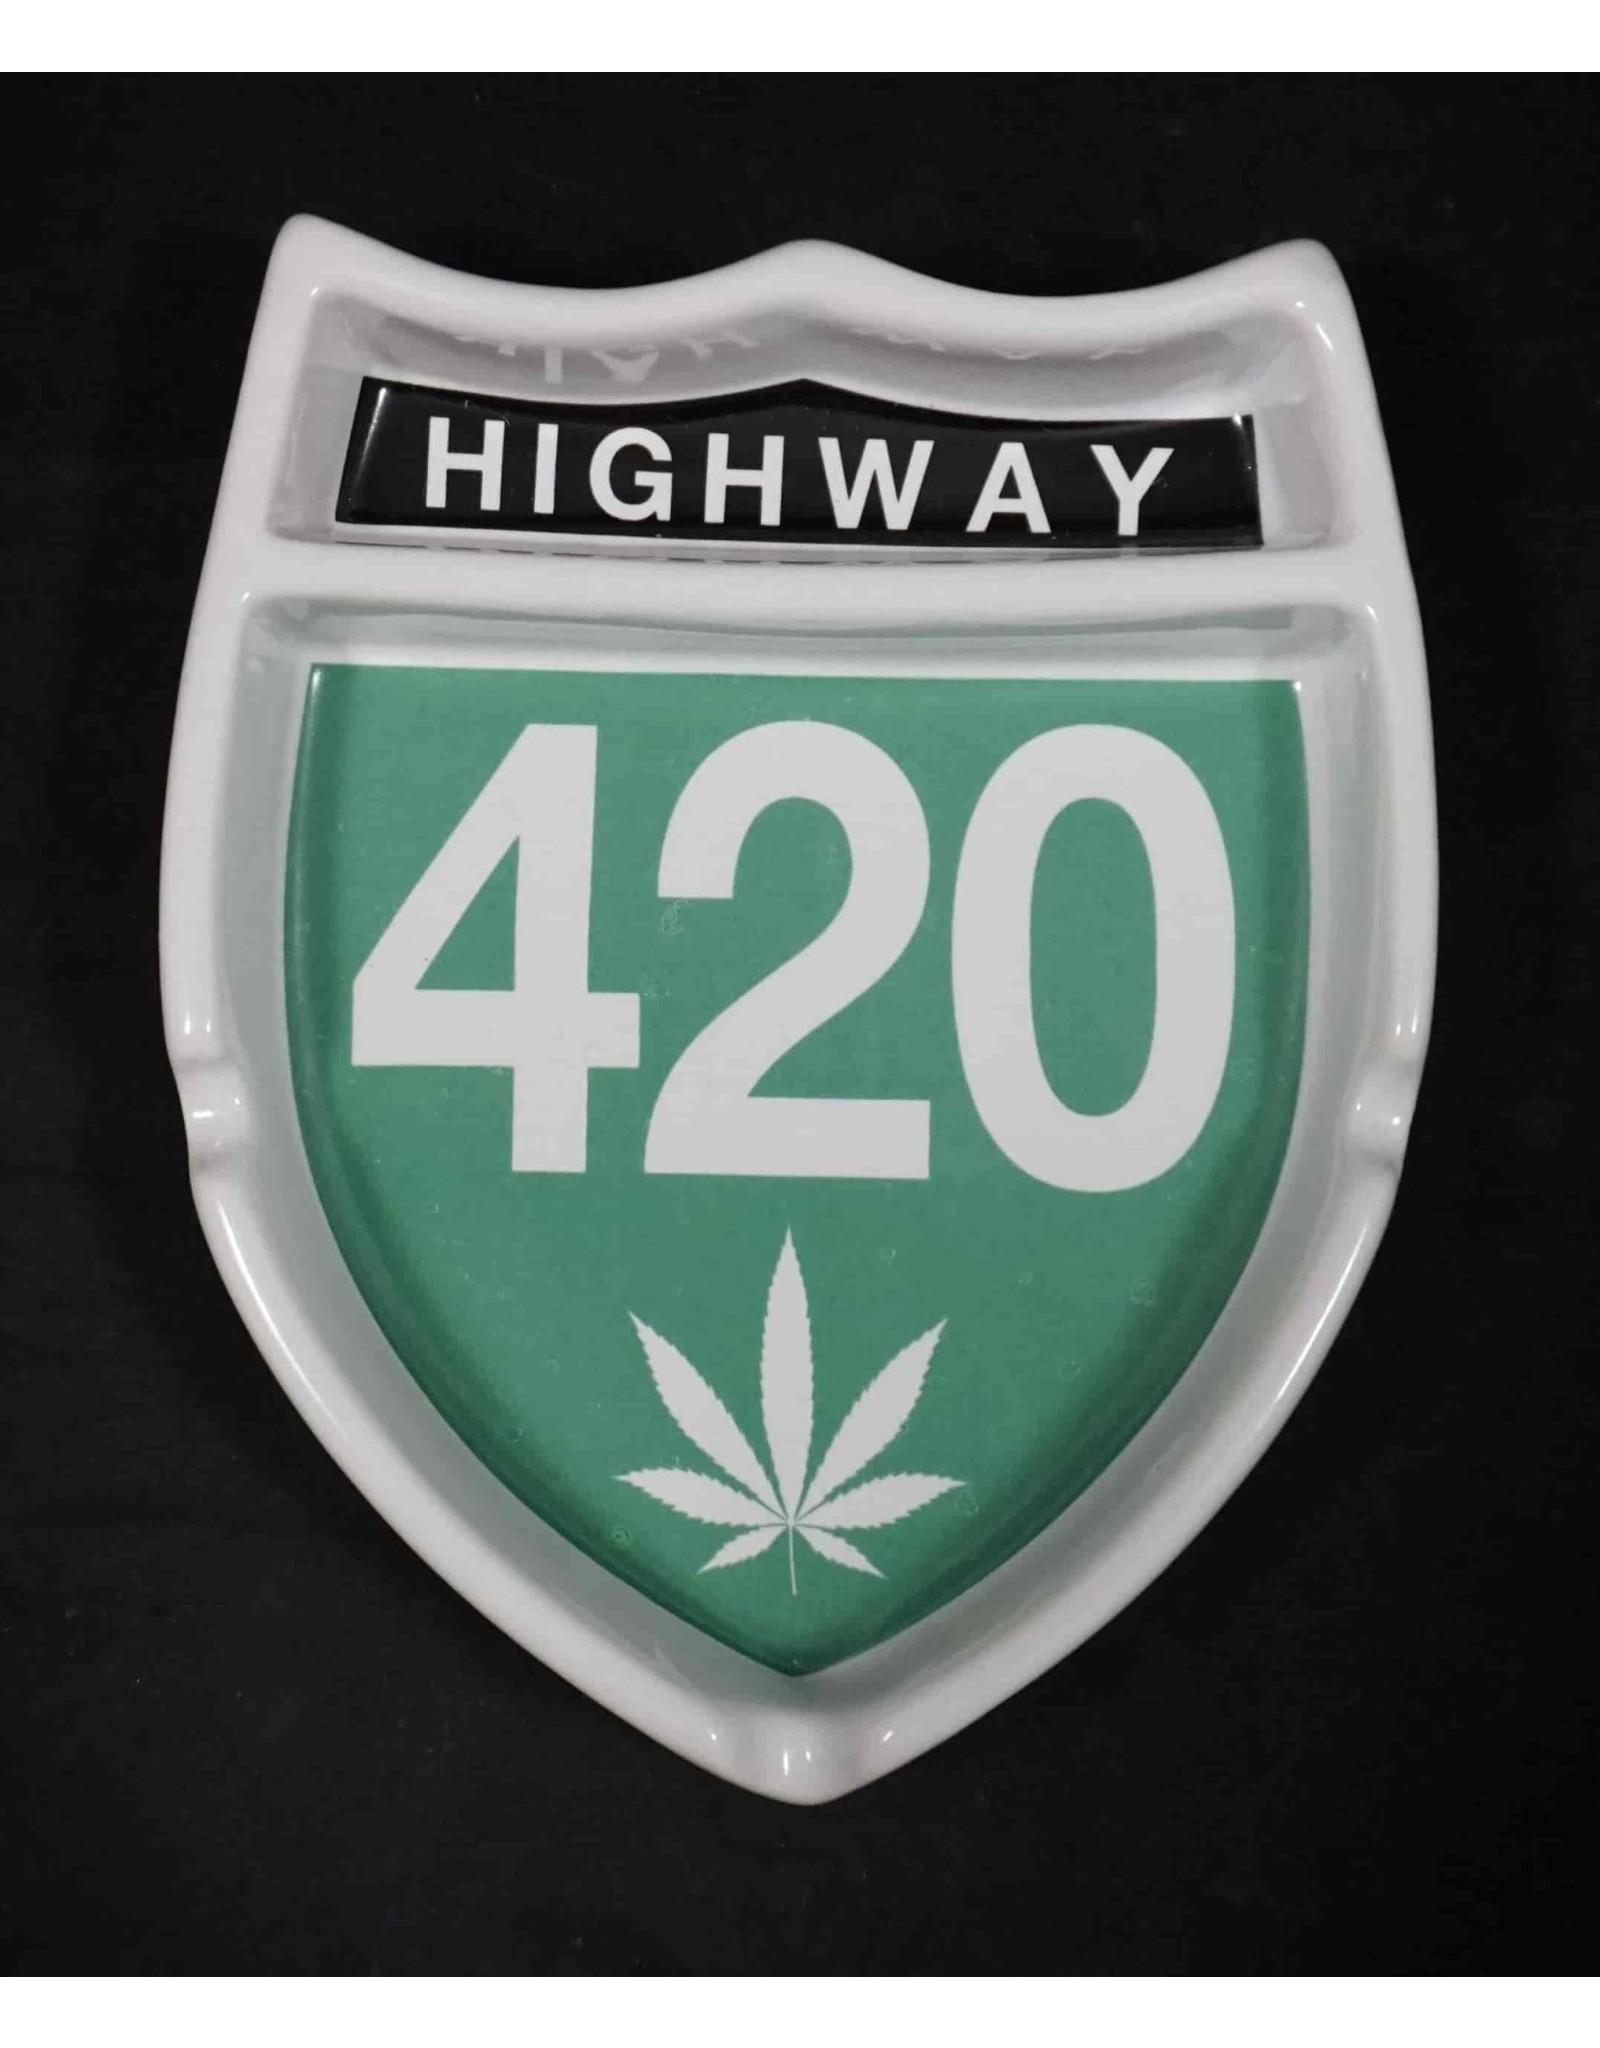 Highway 420 Ceramic Ashtray